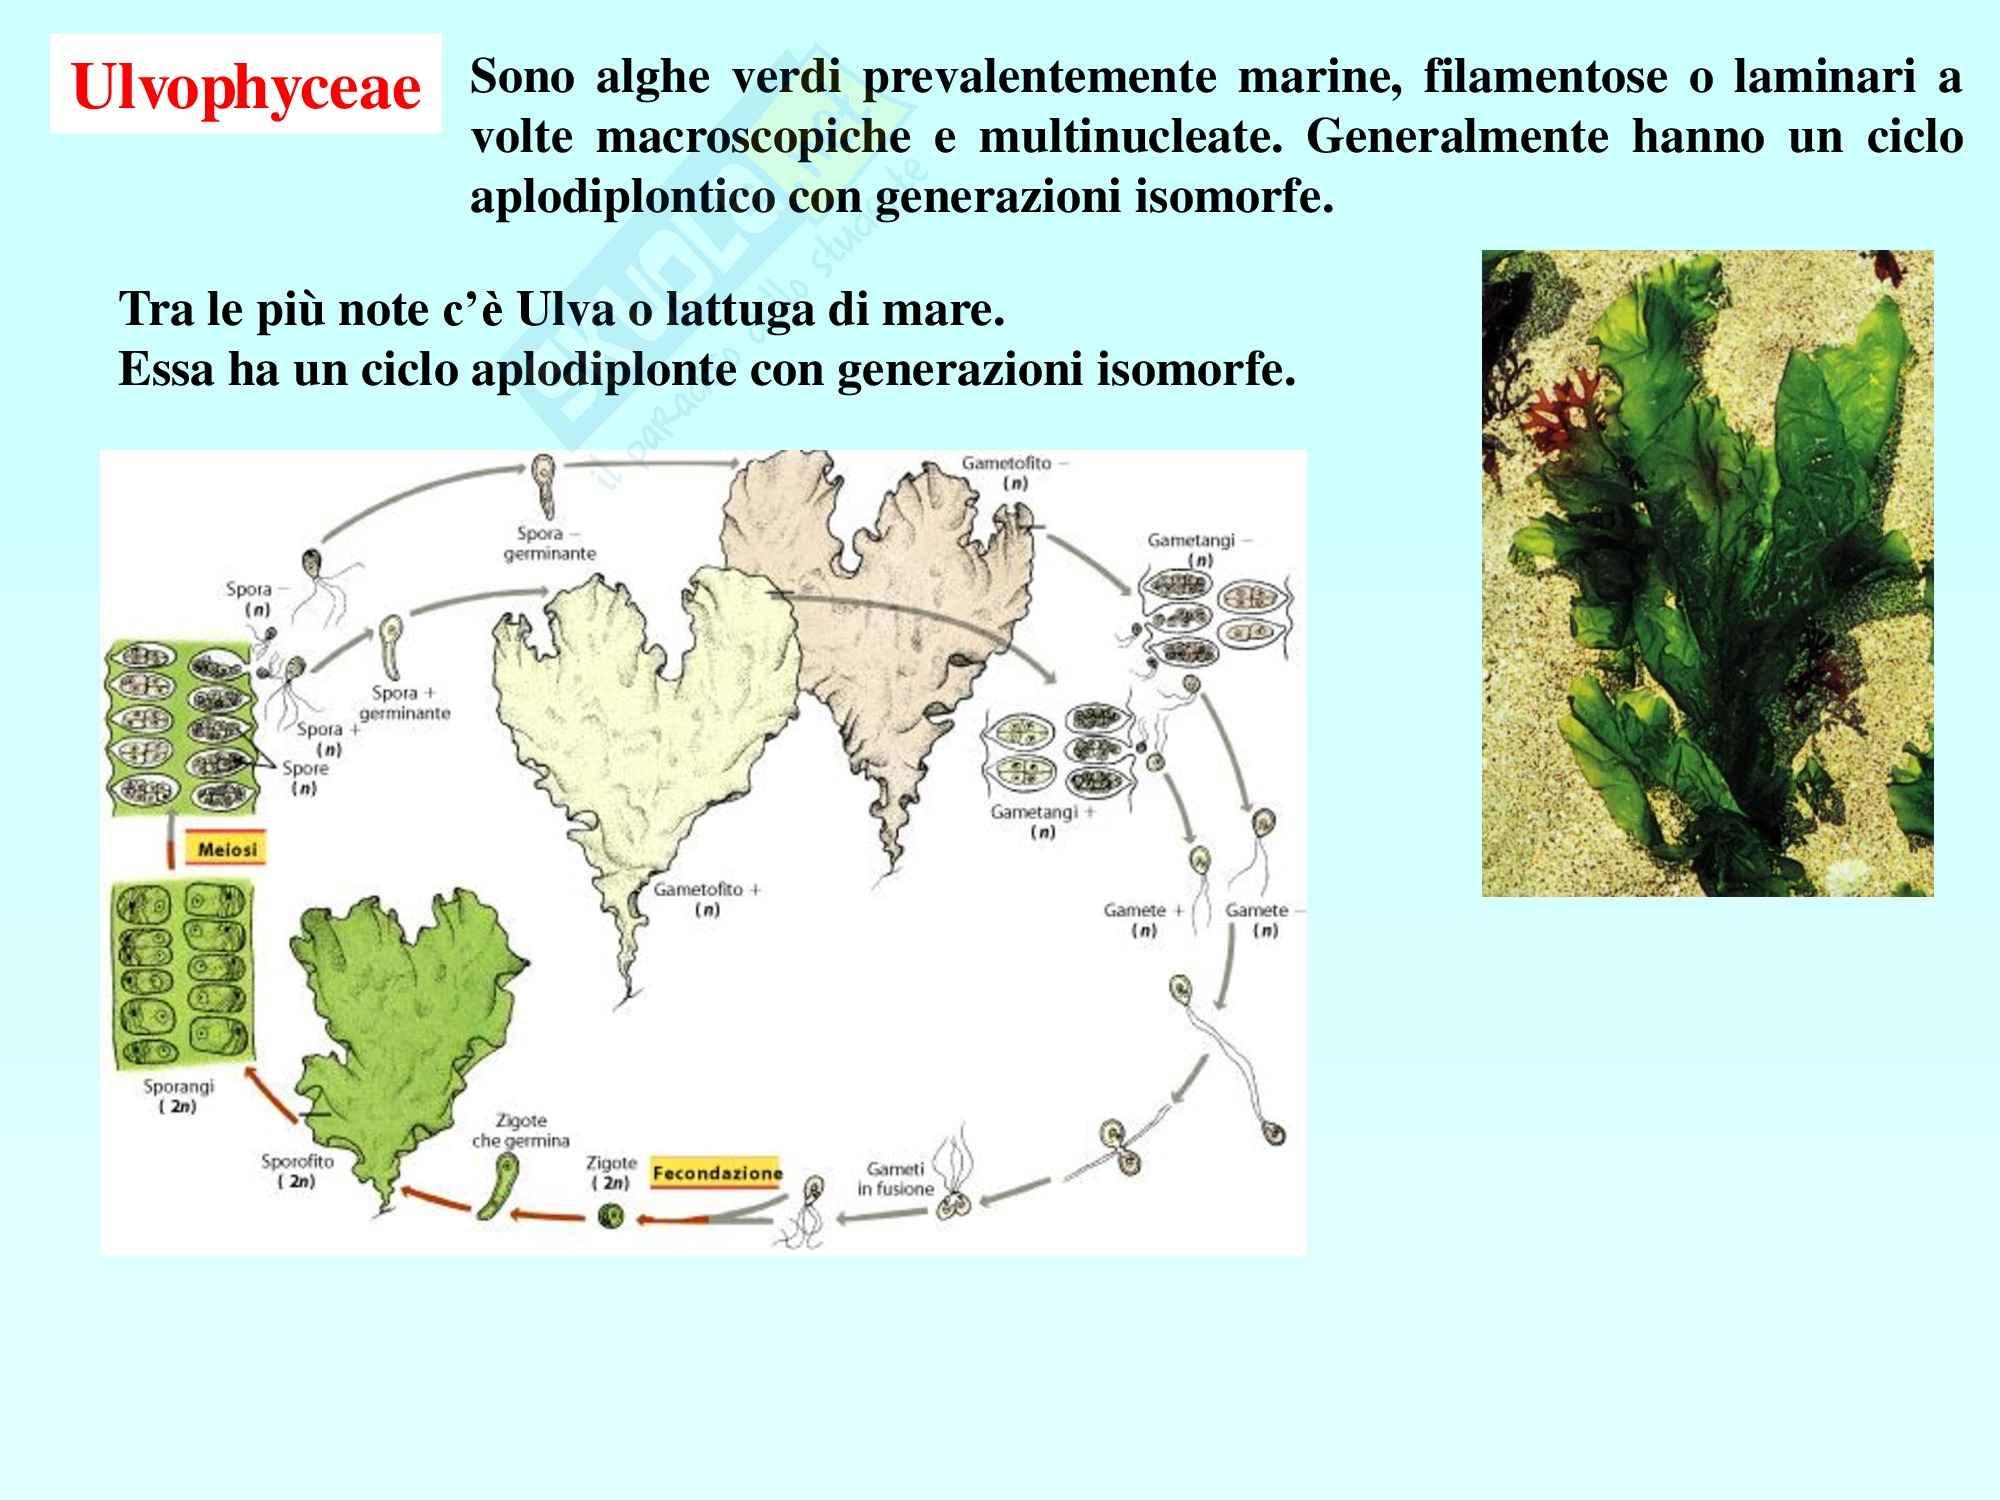 Biologia vegetale - alghe e cicli riproduttivi Pag. 26